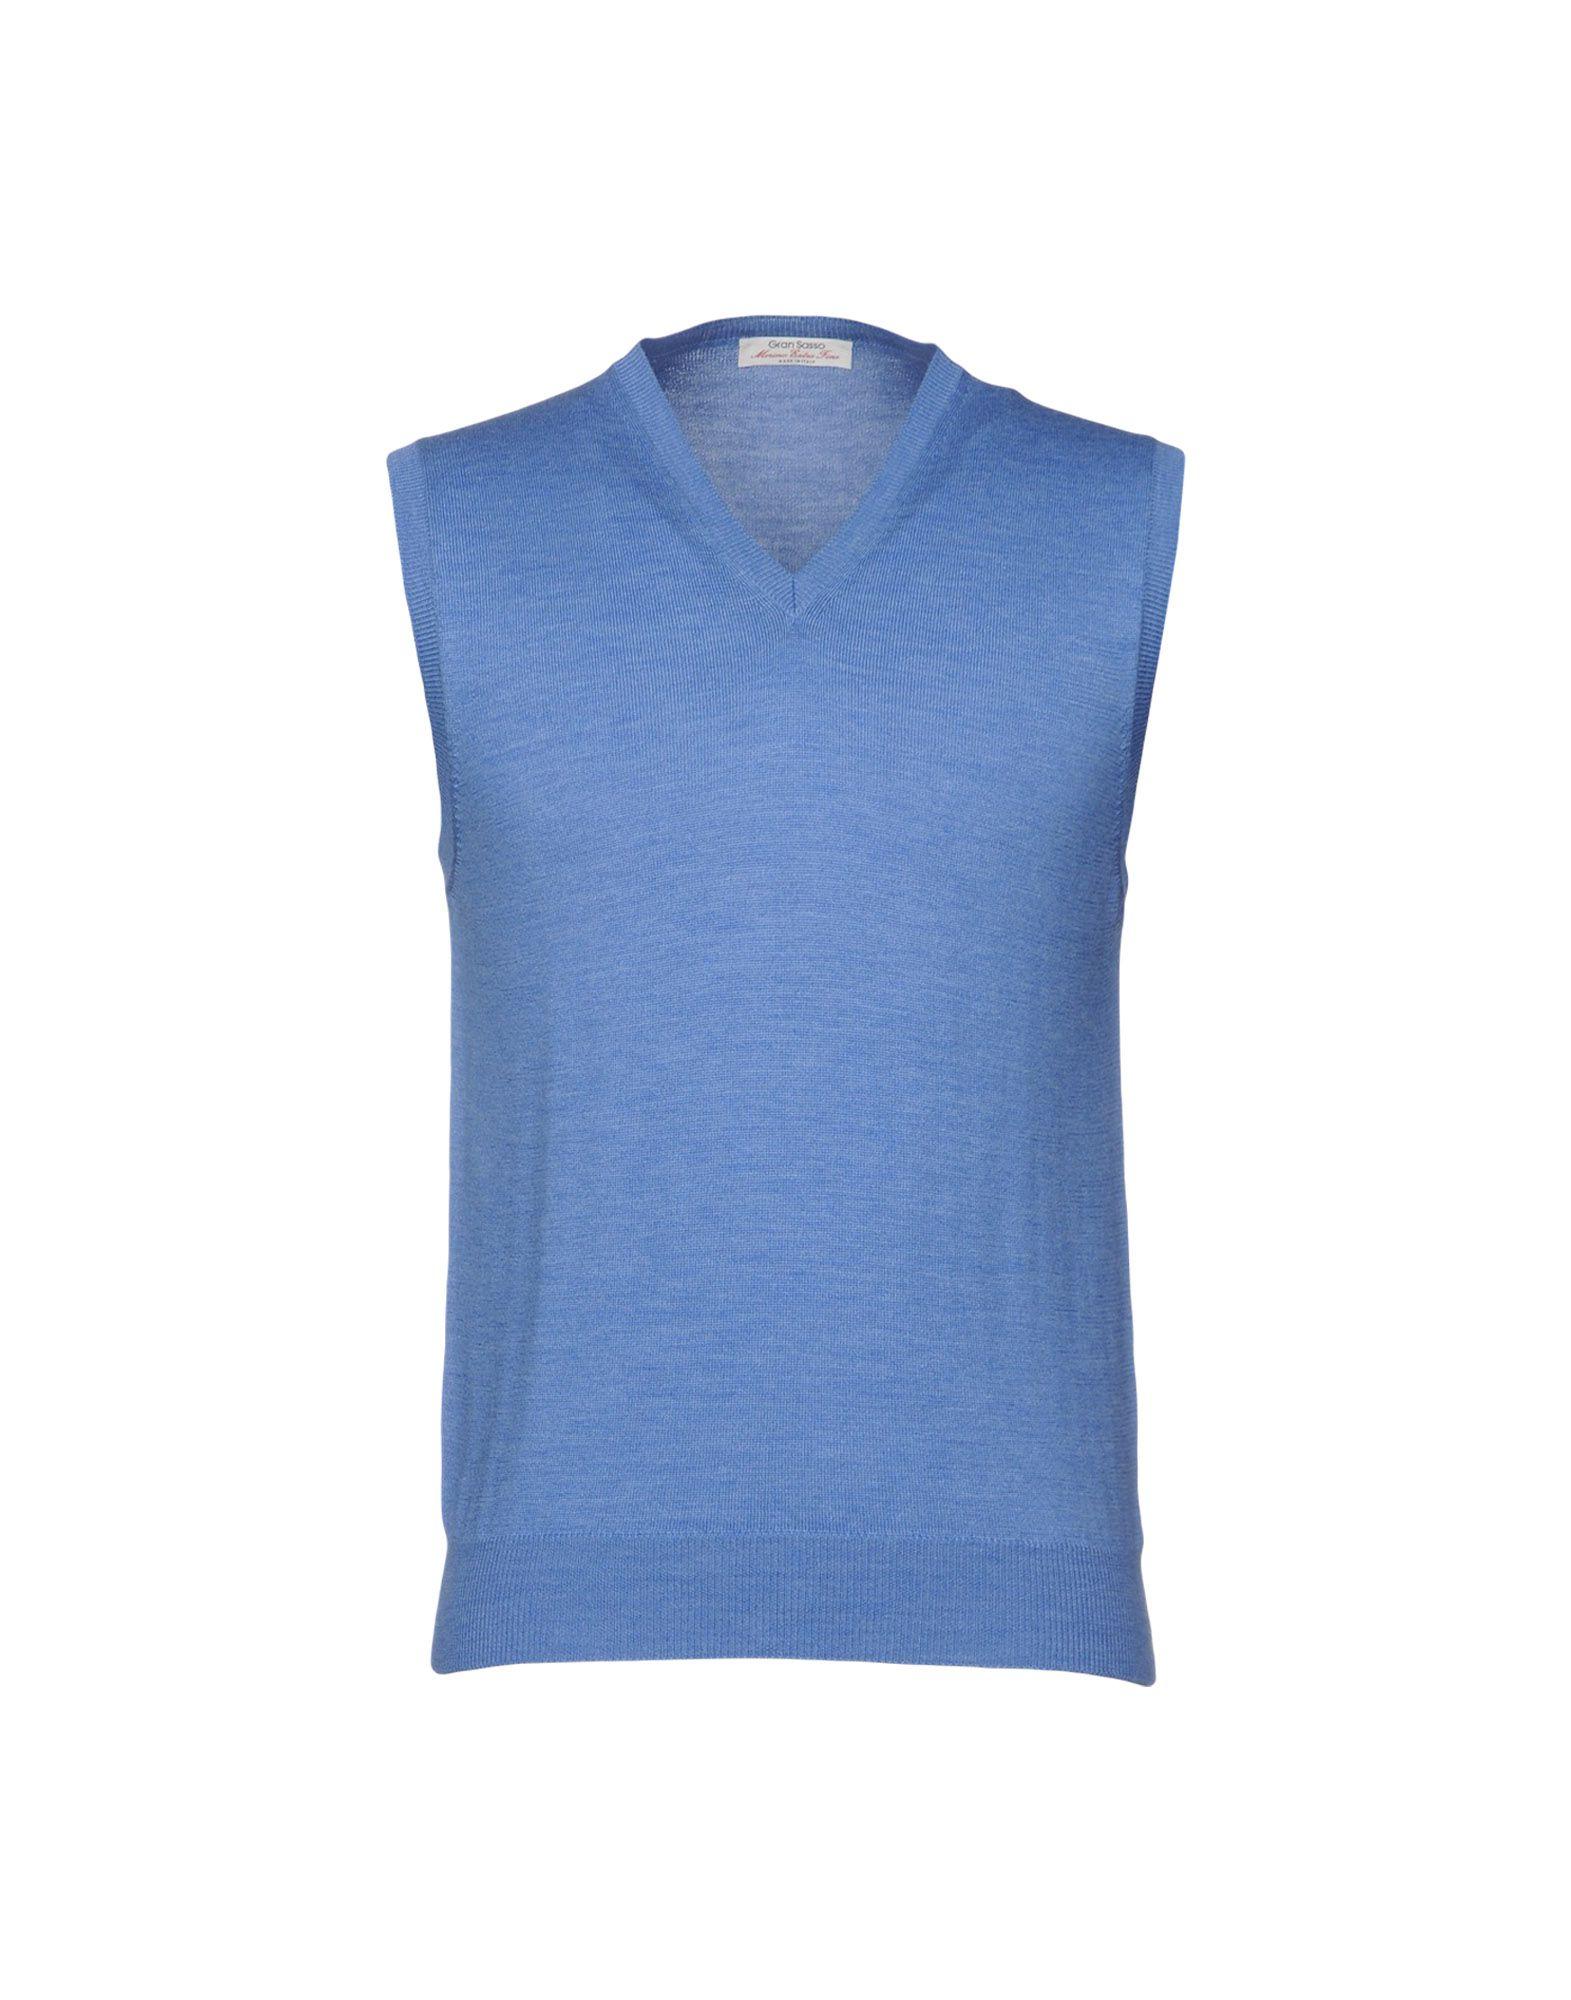 GRAN SASSO Свитер gran sasso свободный голубой свитер